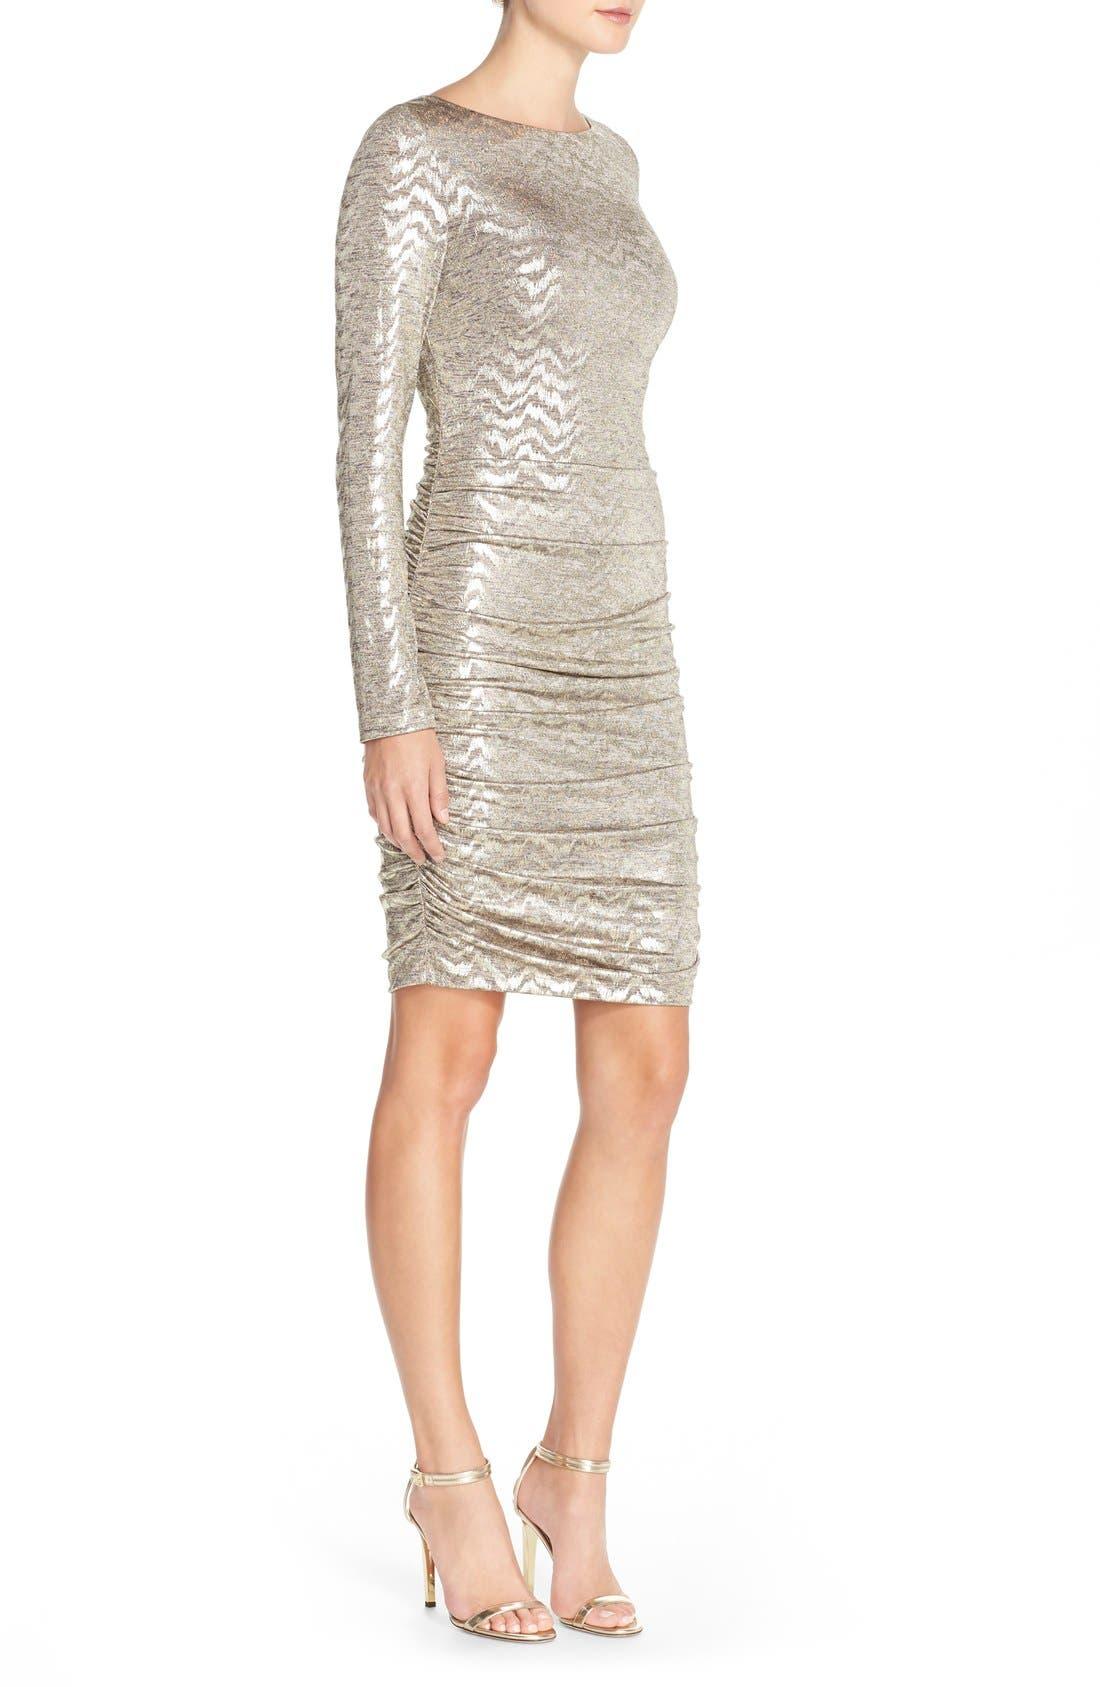 VINCE CAMUTO, Metallic Jersey Body-Con Dress, Alternate thumbnail 4, color, 710